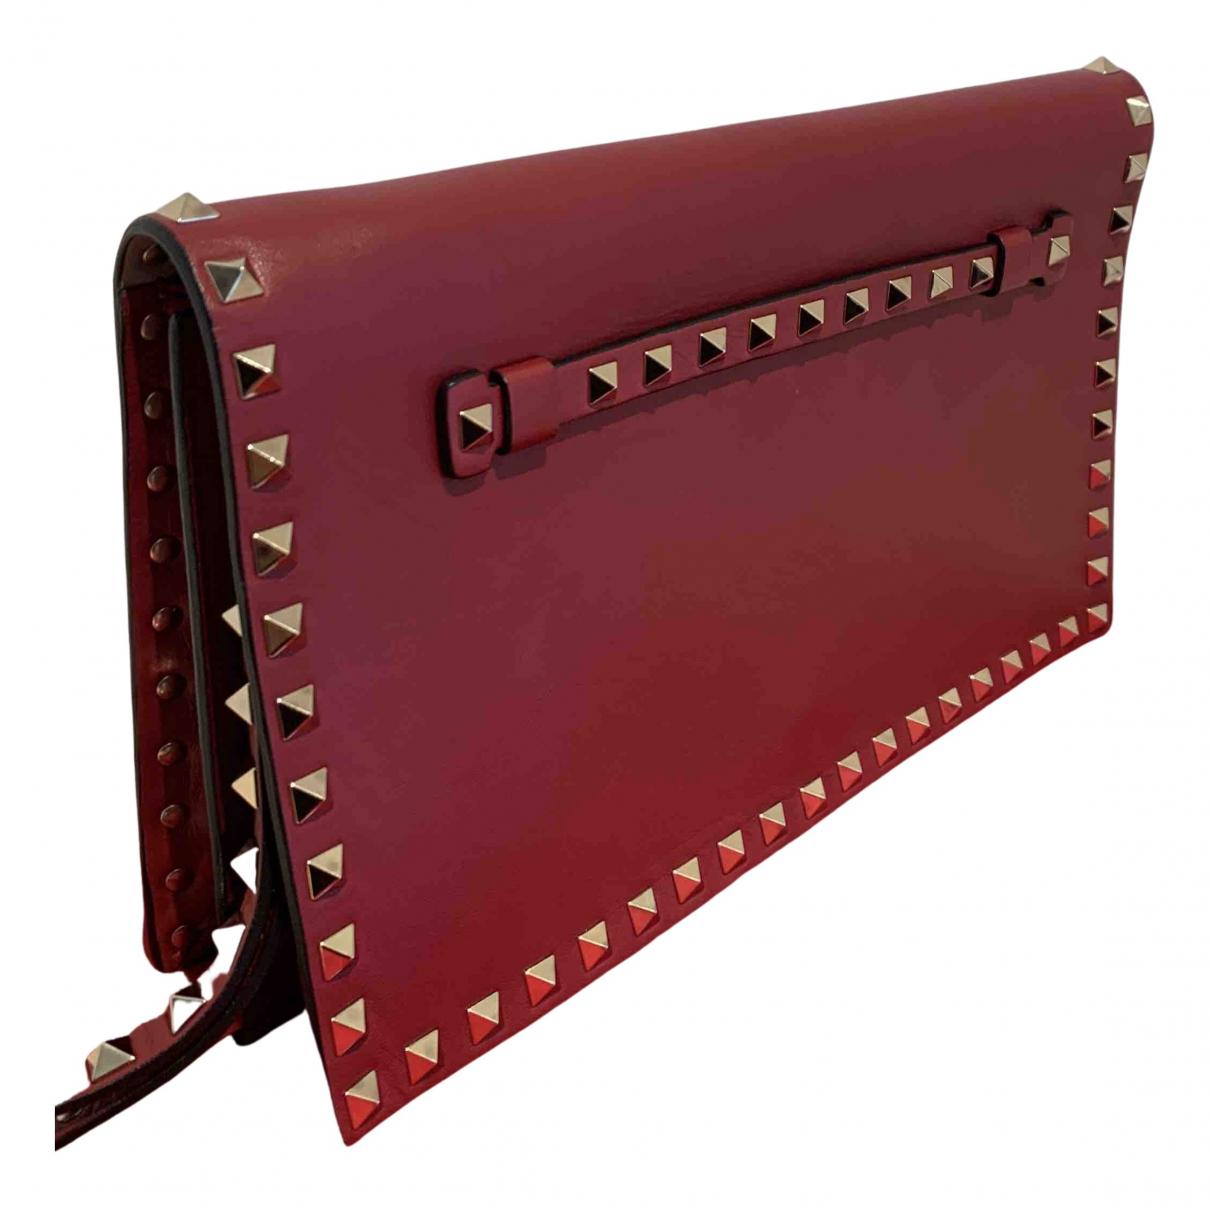 Valentino Garavani Rockstud Burgundy Leather Clutch bag for Women N